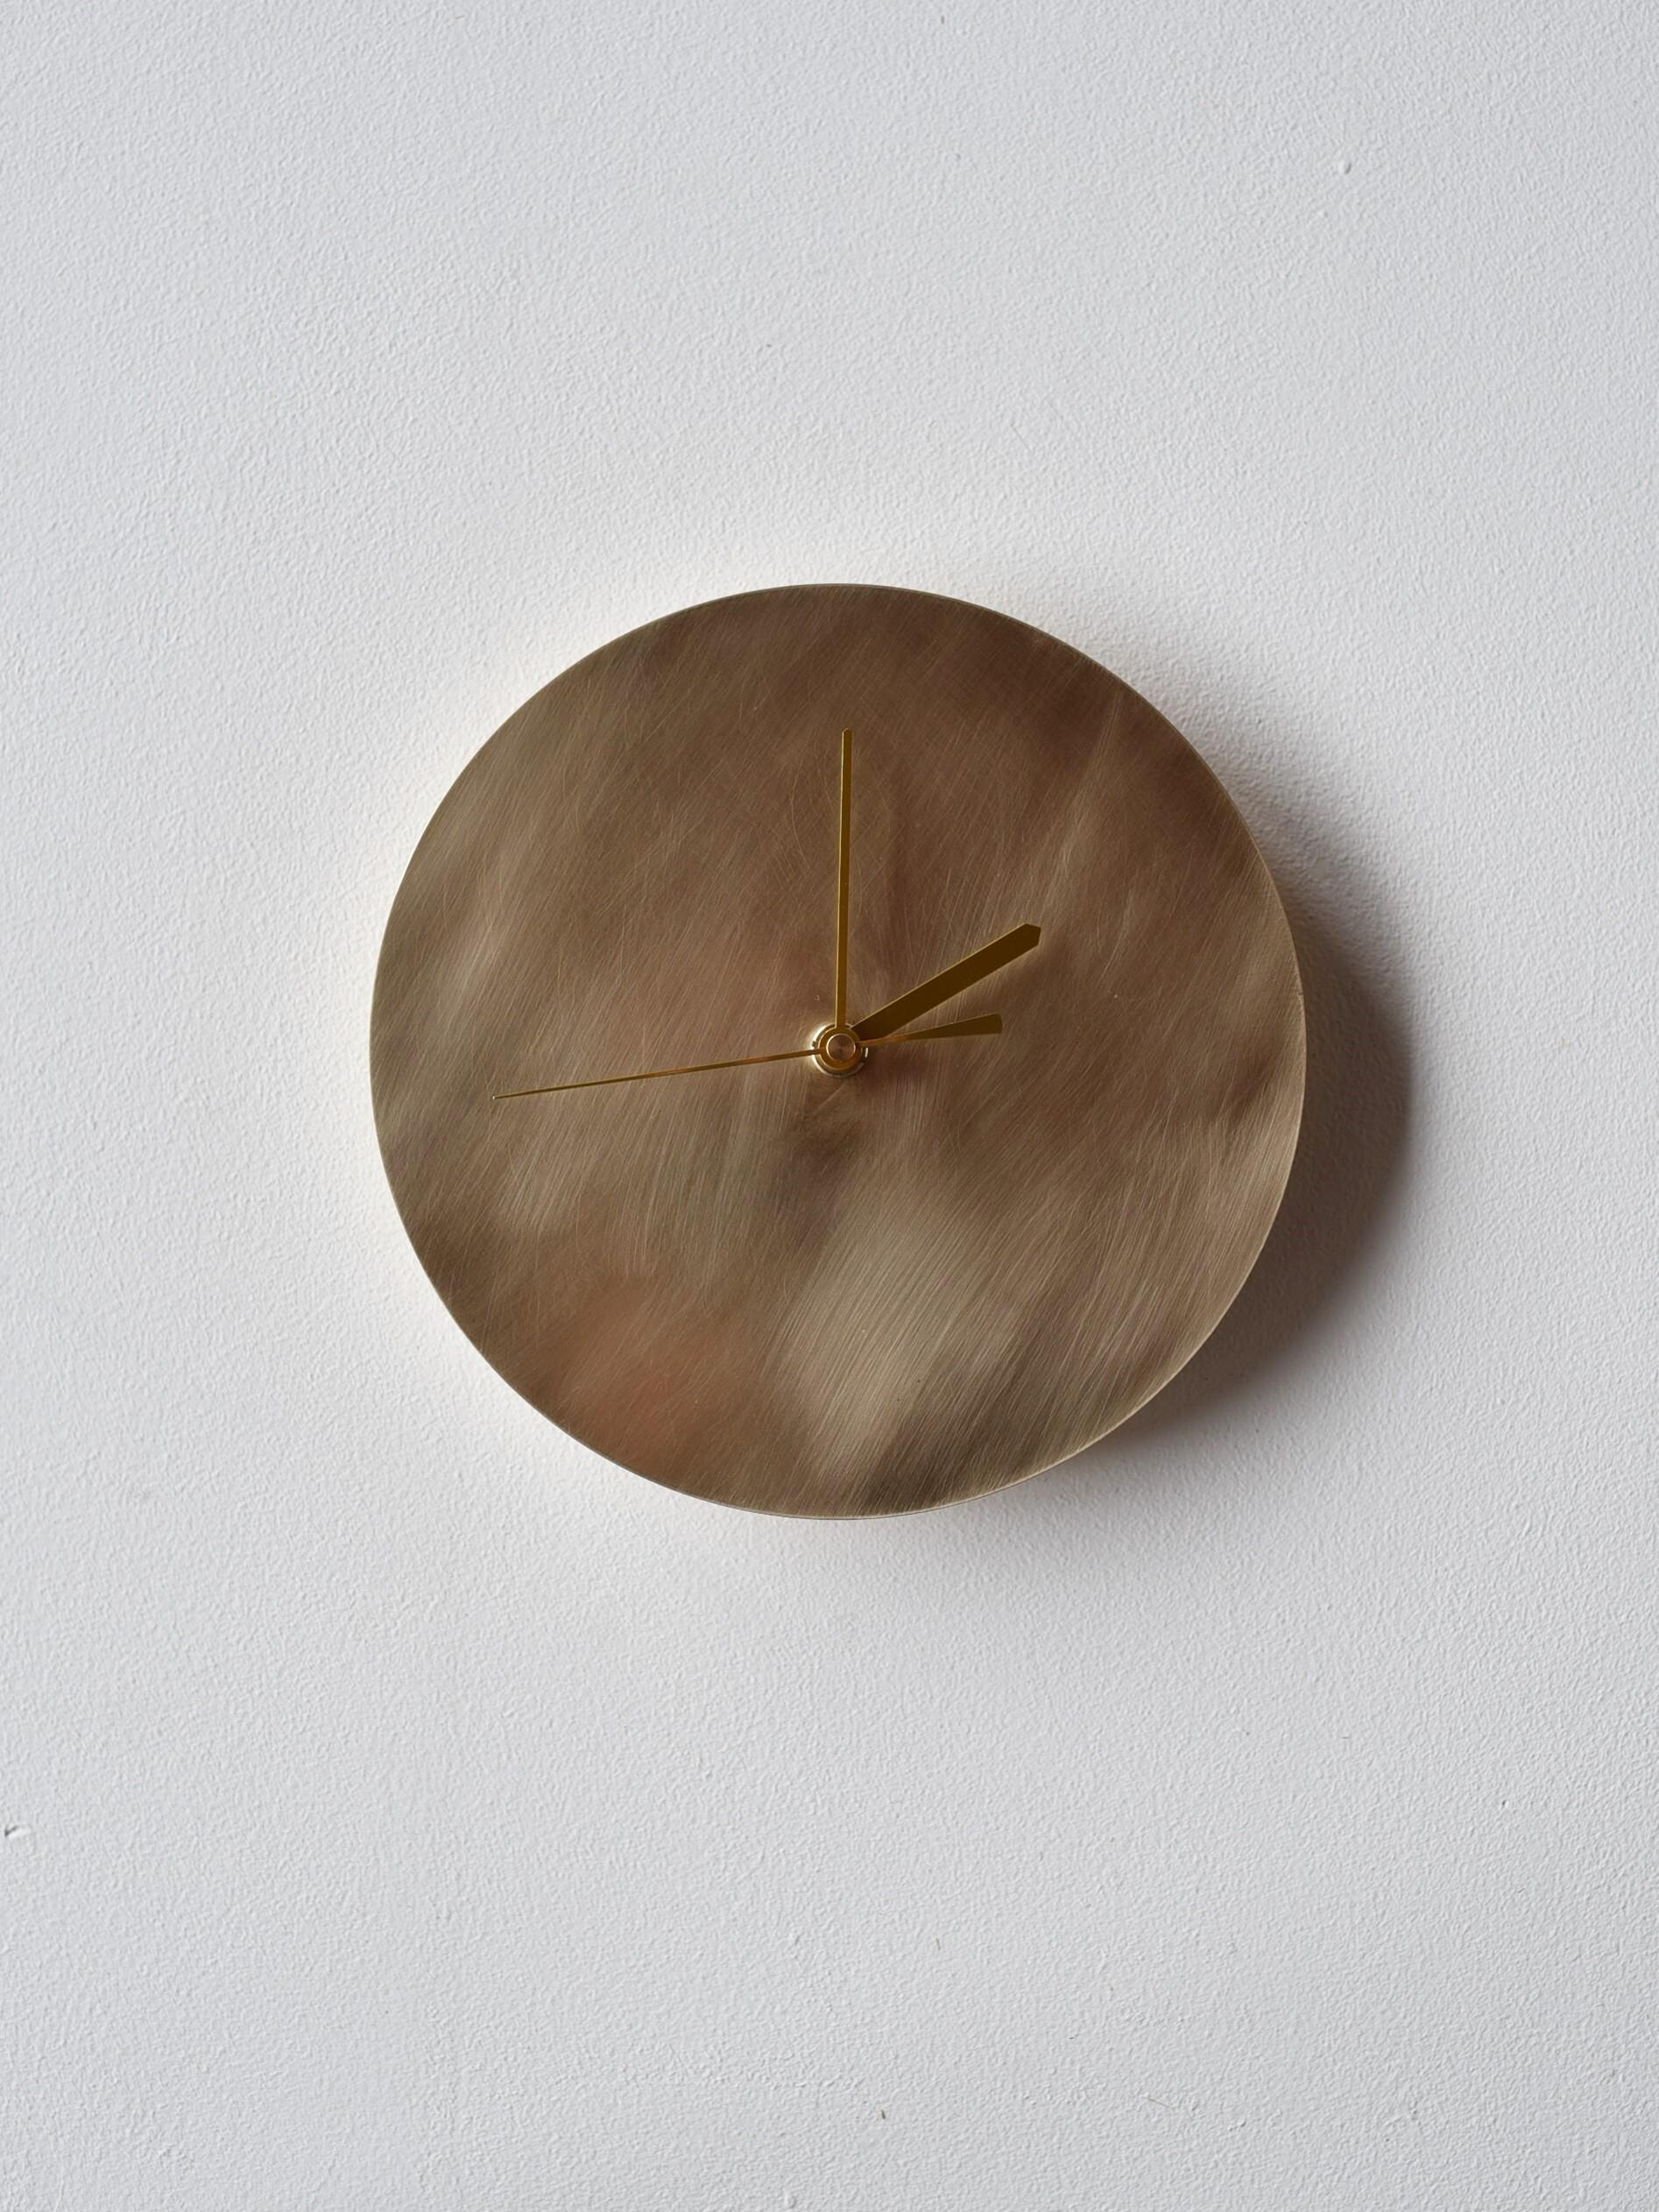 sen|壁掛時計